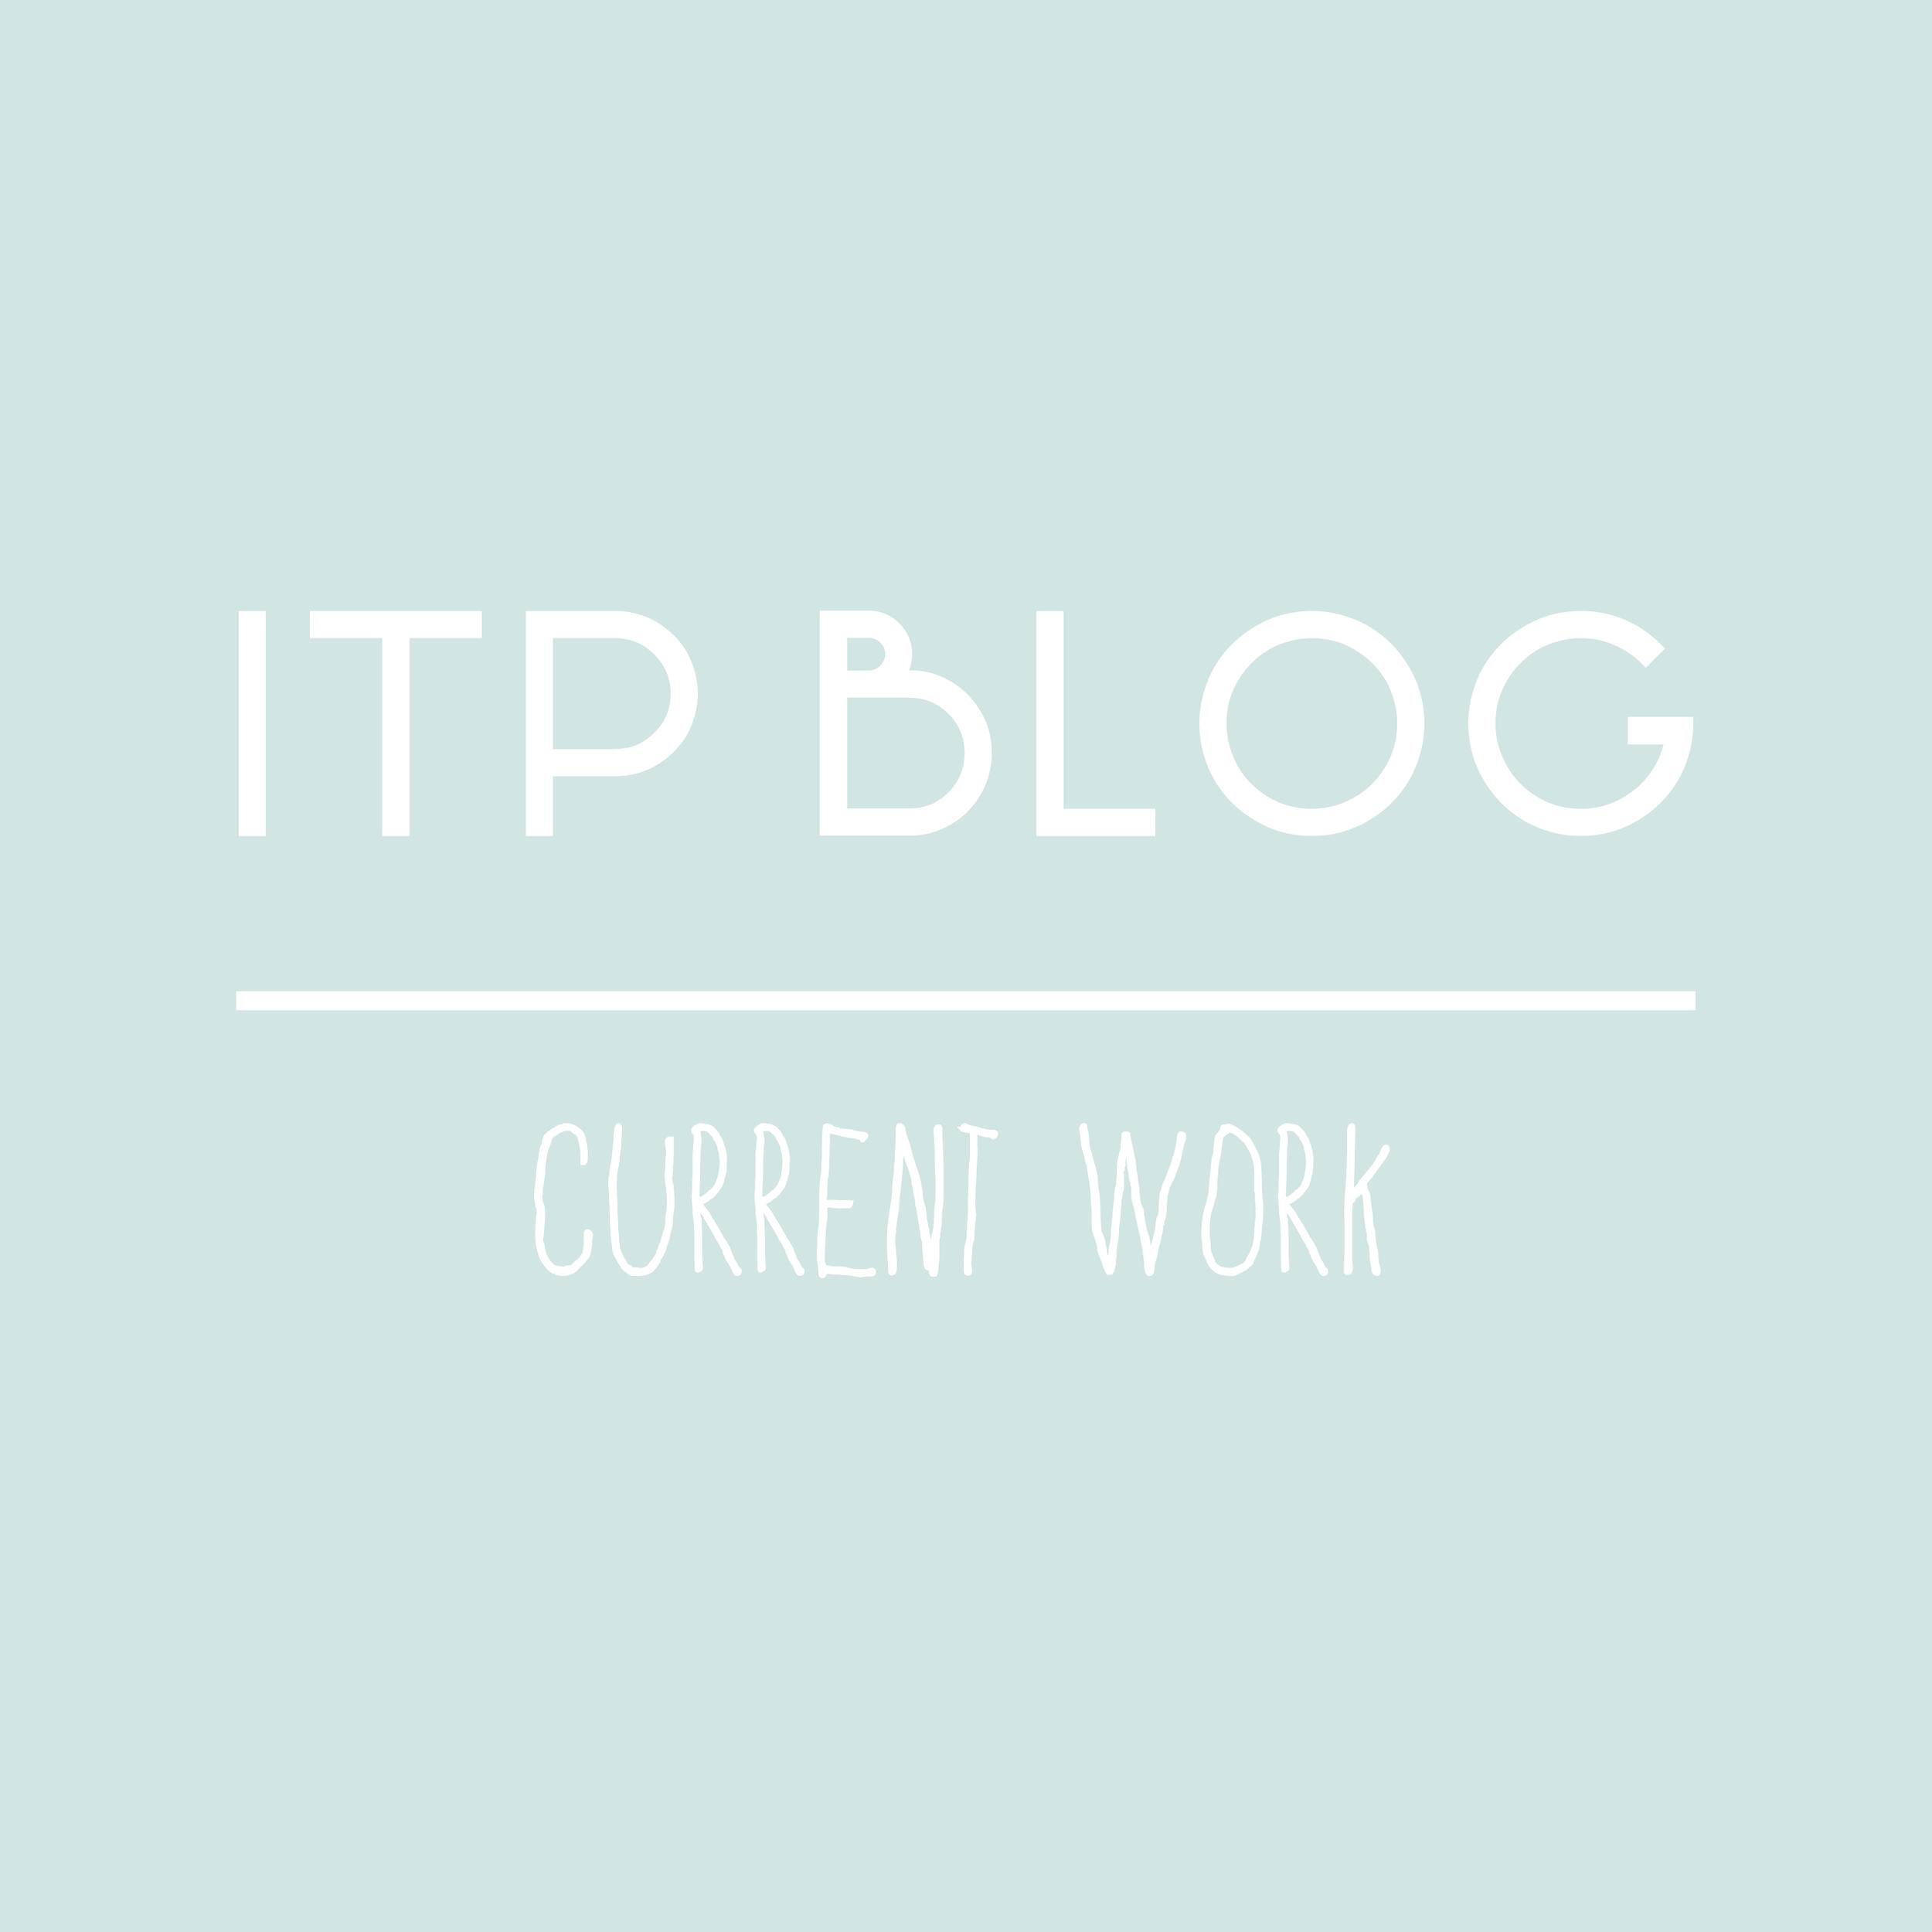 itpblog_thumbnail1.png